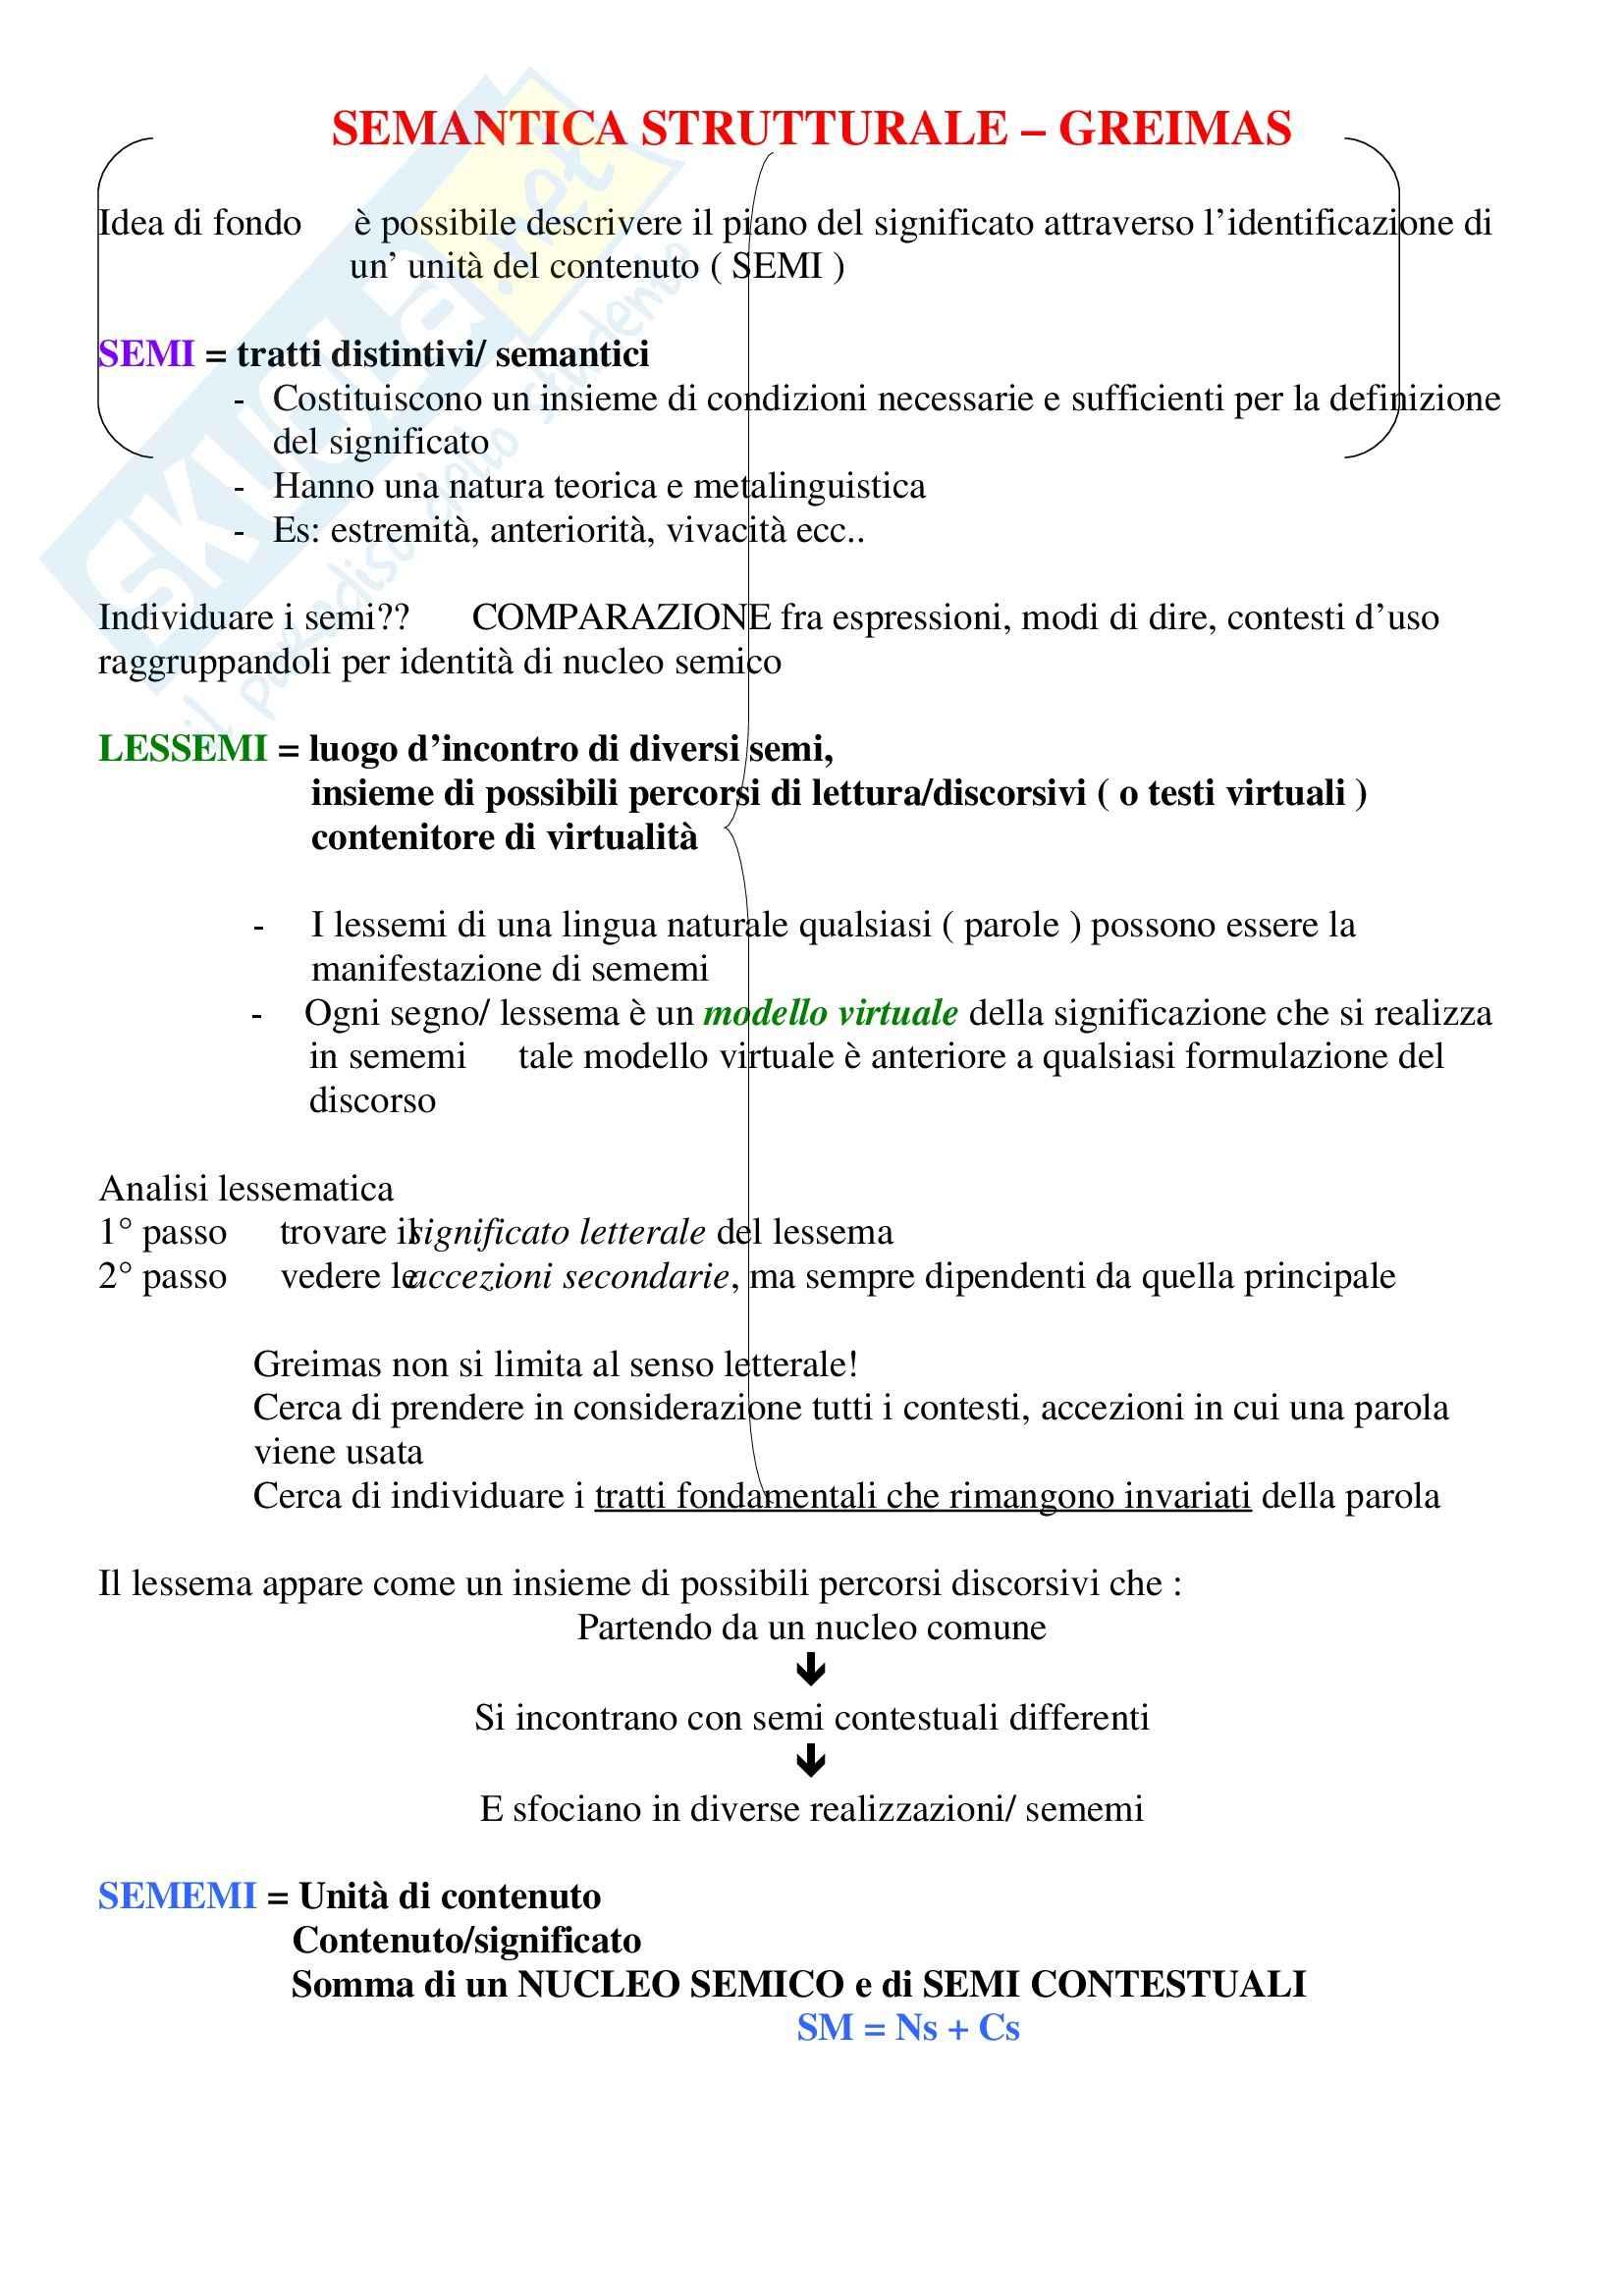 Semantica strutturale di Greimas, Semiotica